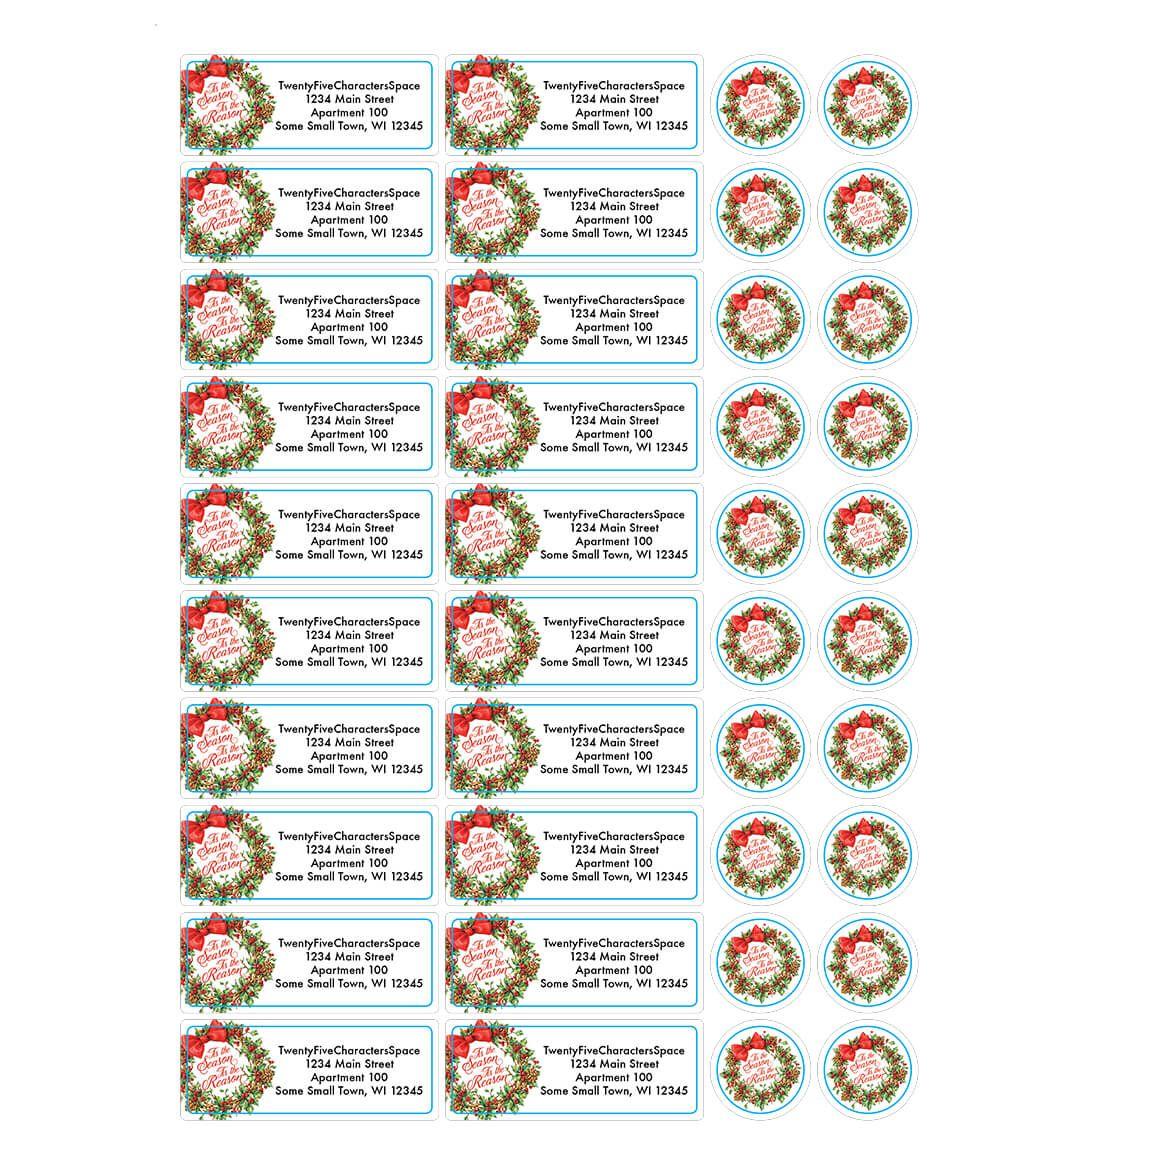 Personalized Tis the Reason Address Labels & Envelope Seals 20-364765